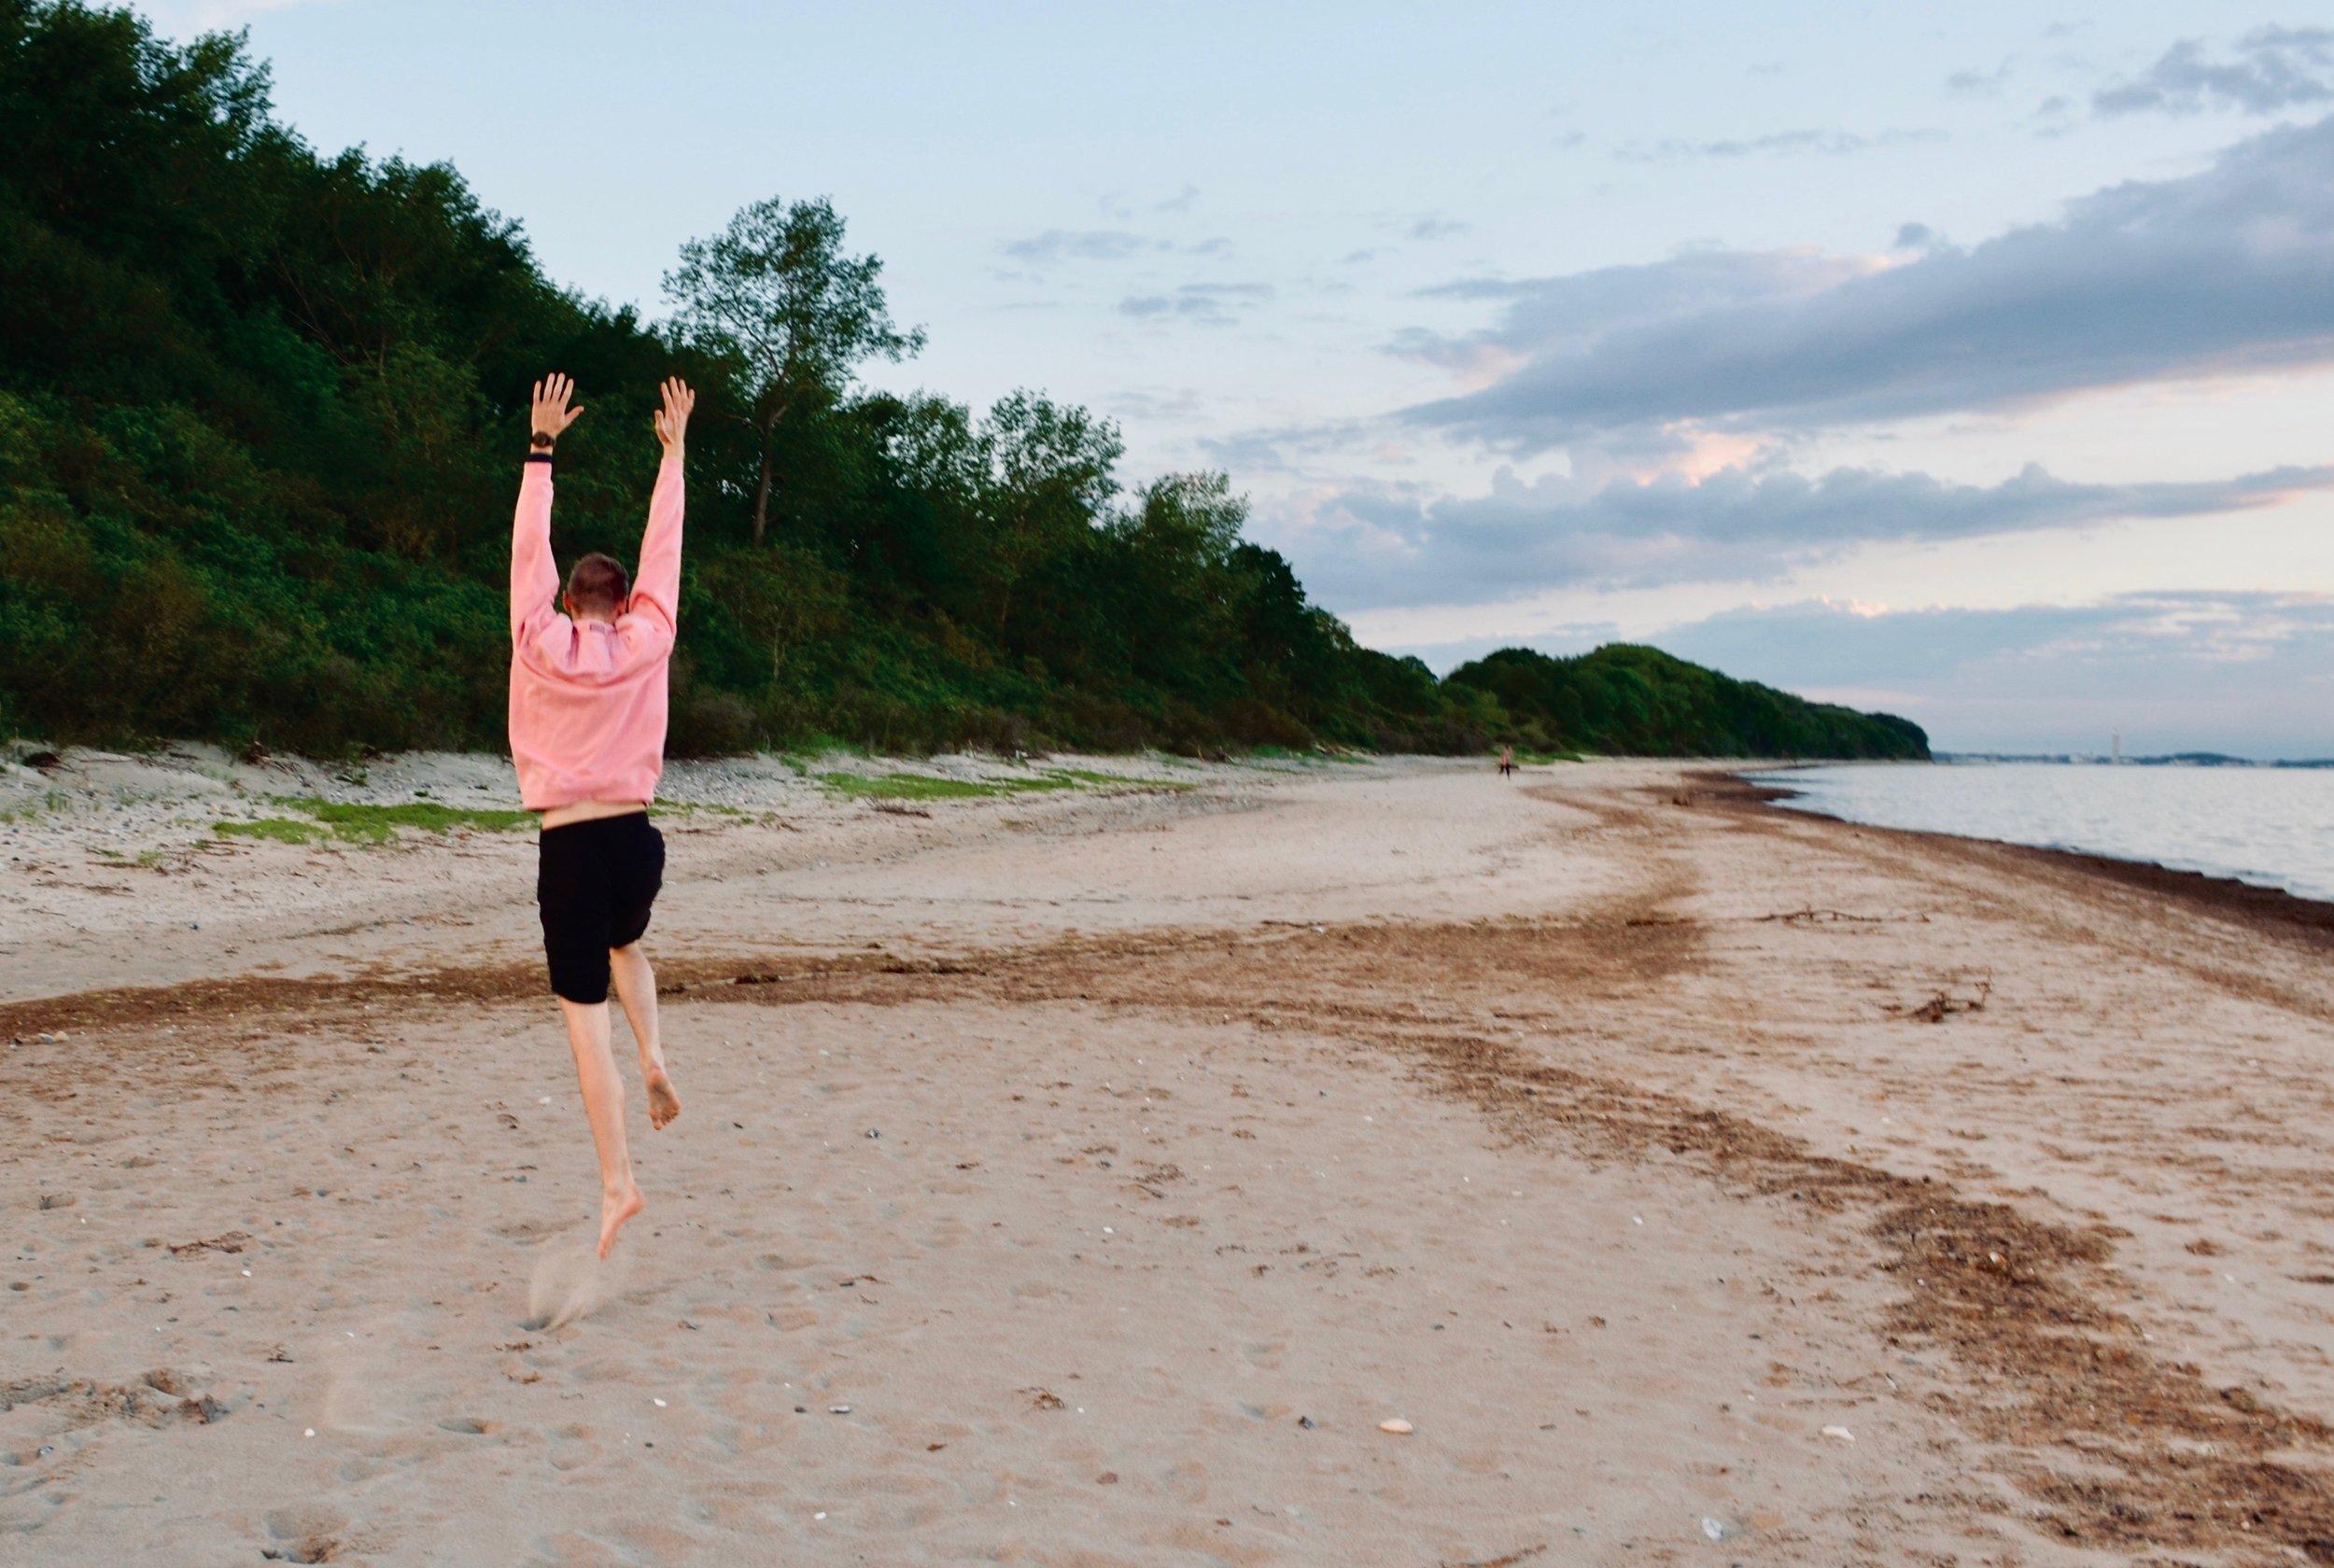 Evan Currie enjoys an evening along the Baltic Sea.